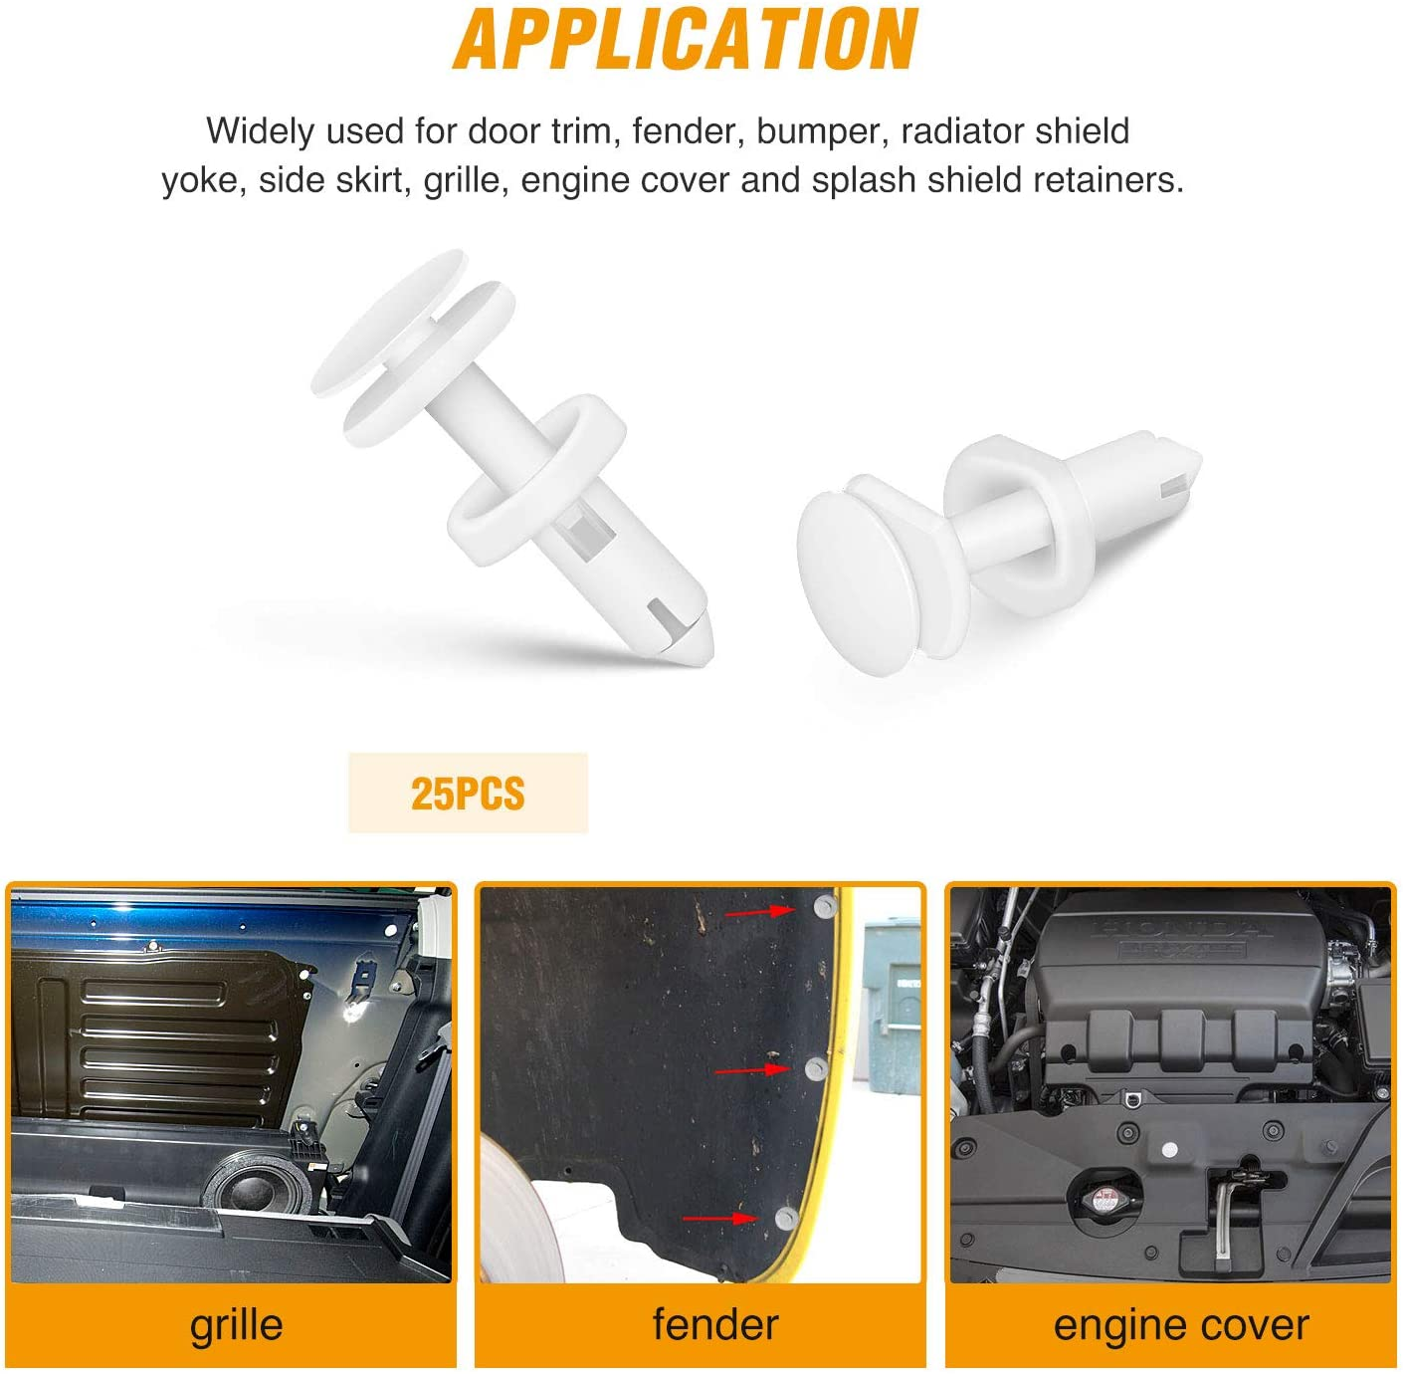 GOOACC 115 Pcs Automotive Nylon Universal Pop Rivet Assortment 6 Most Popular Sizes /& Applications for GM Ford Chrysler VW